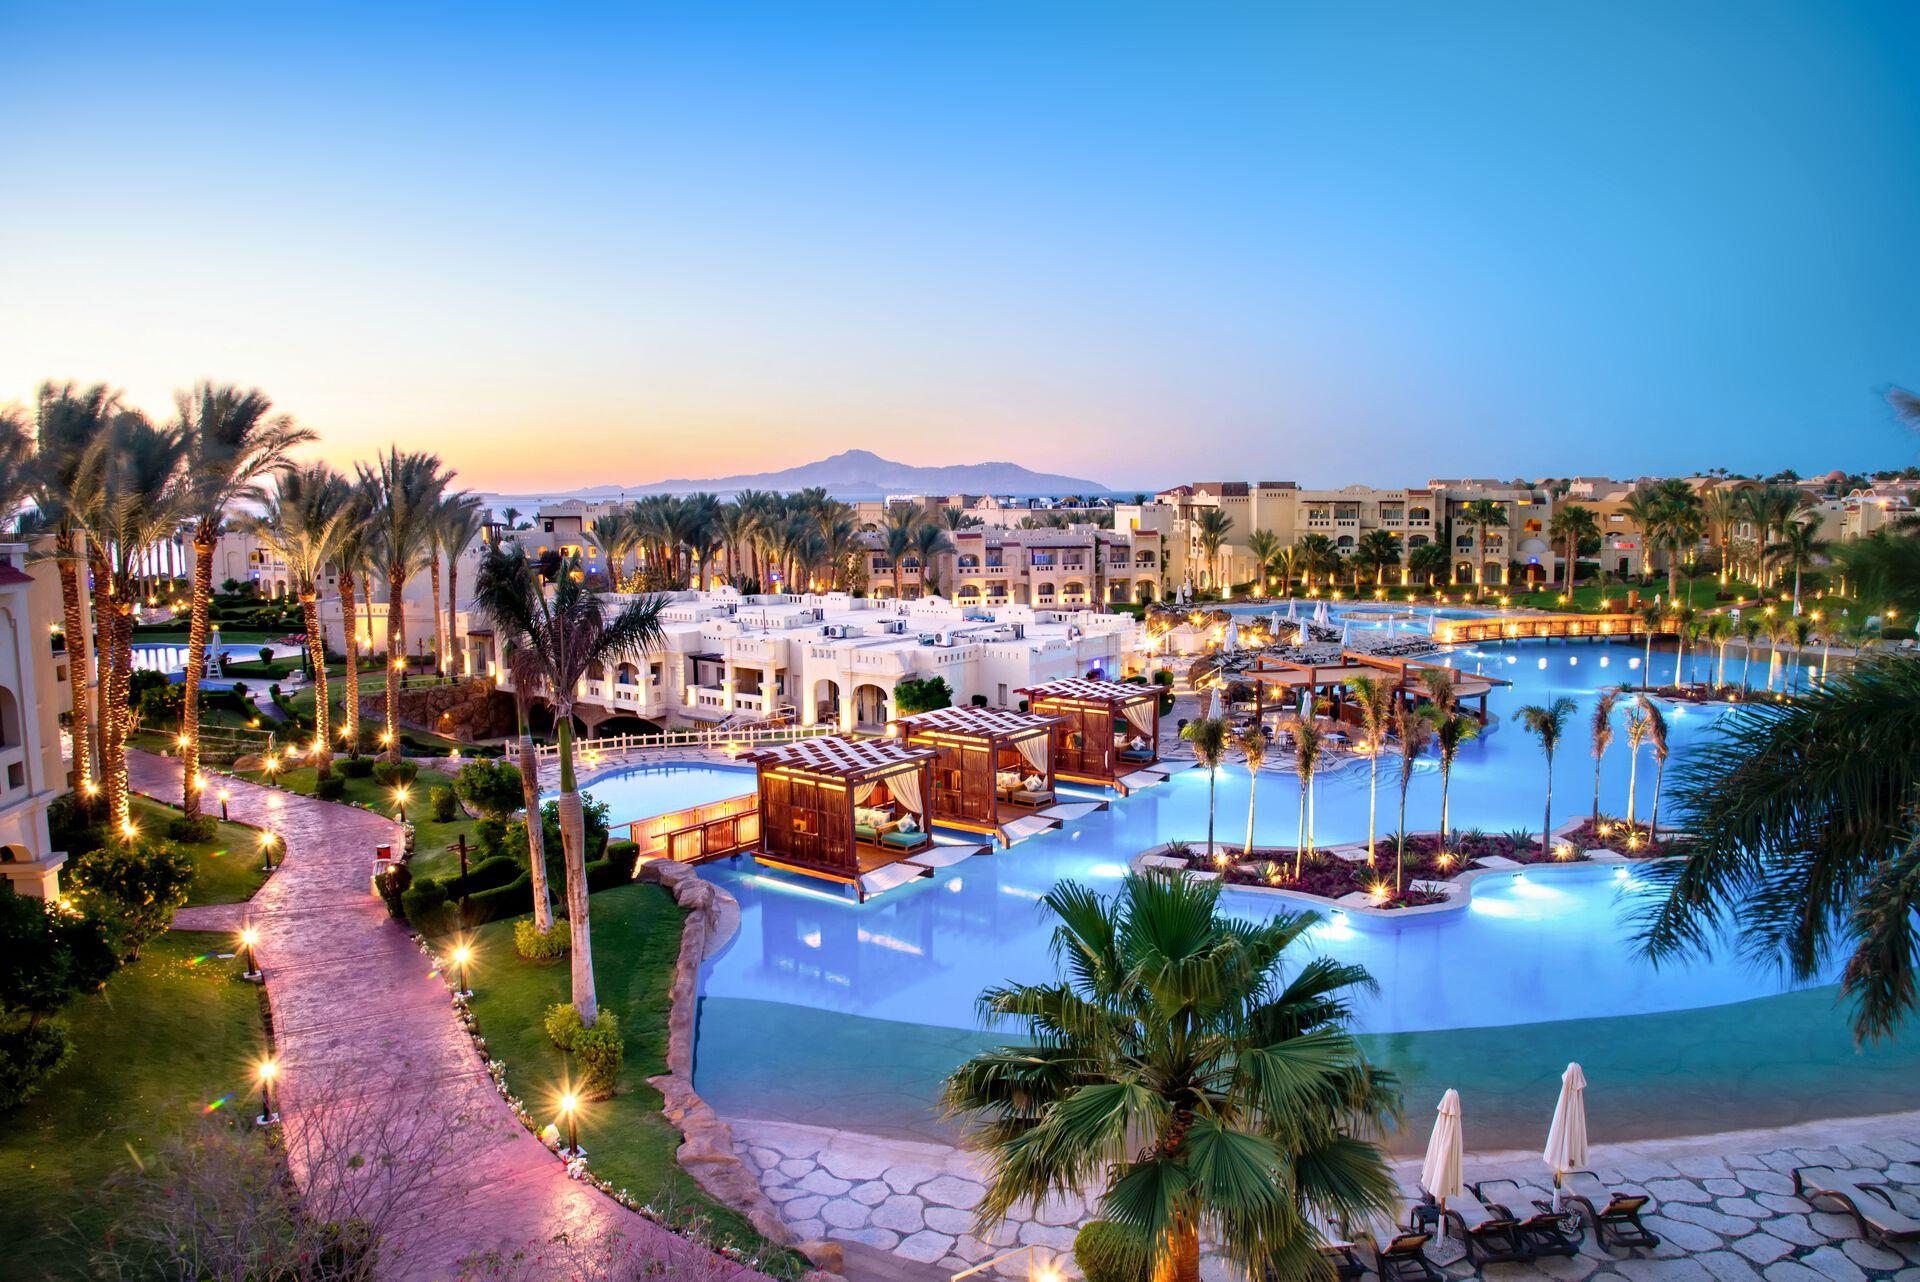 Hôtel rixos sharm el sheikh 5*